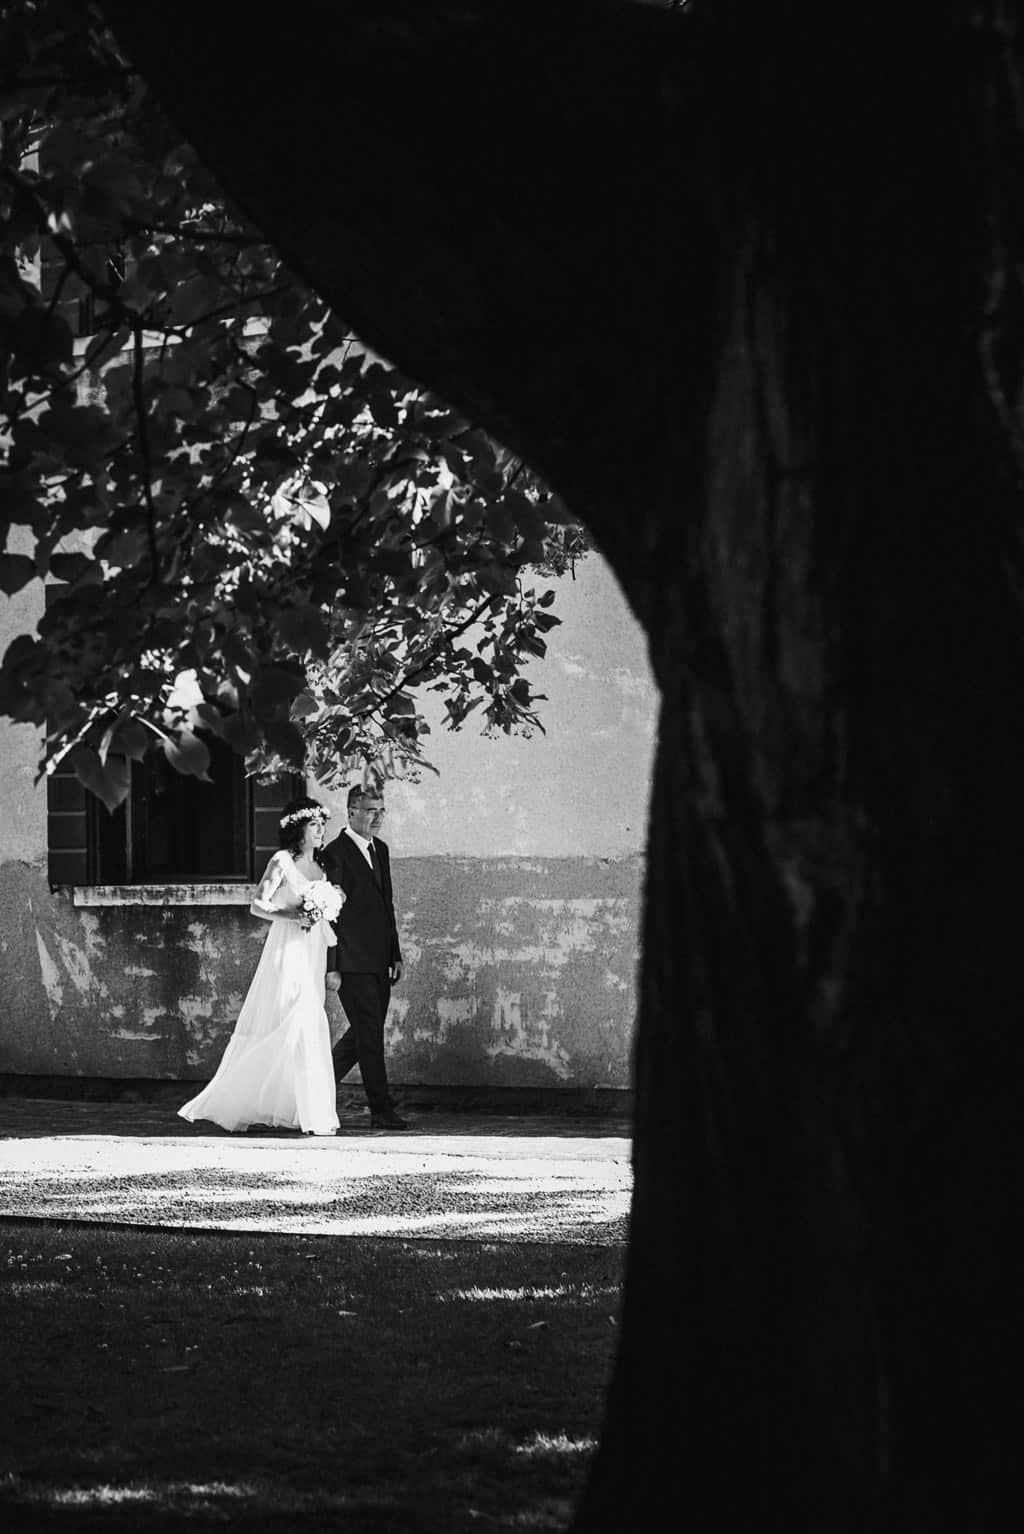 882 matrimonio riviera del brenta Matrimonio Villa Valier   Mira   Riviera del Brenta   Venezia